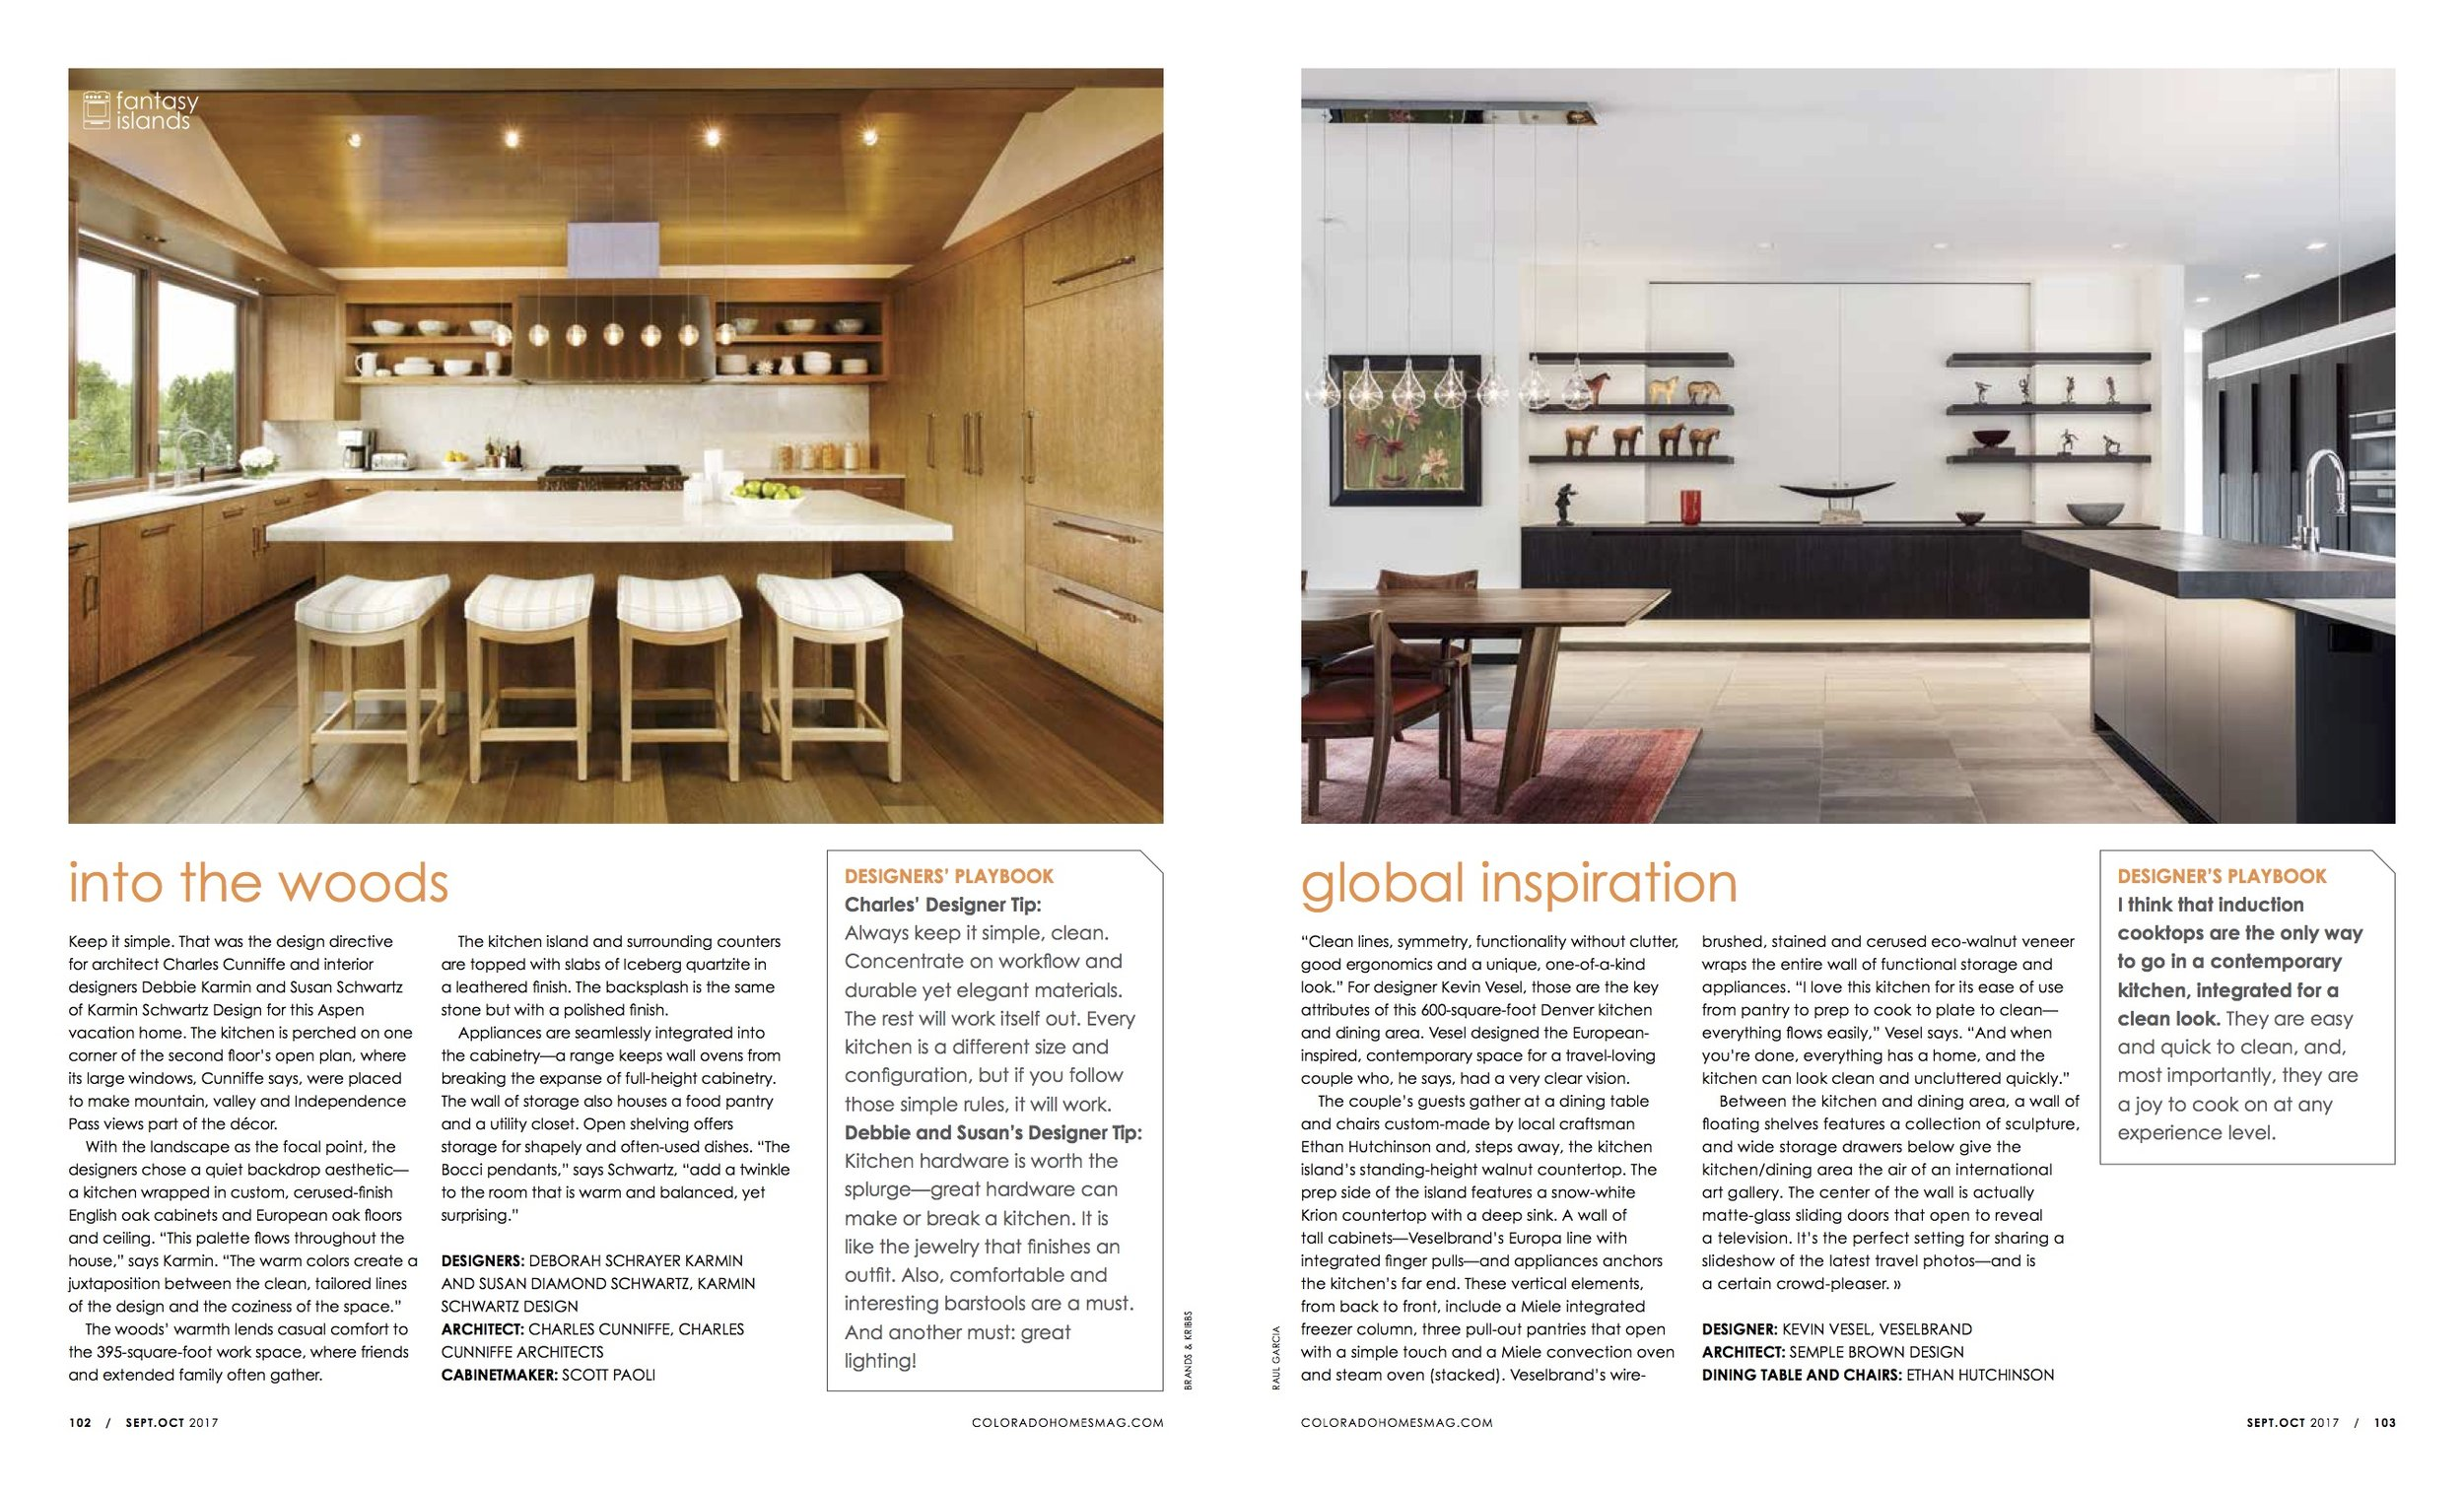 kitchens sp7.jpg